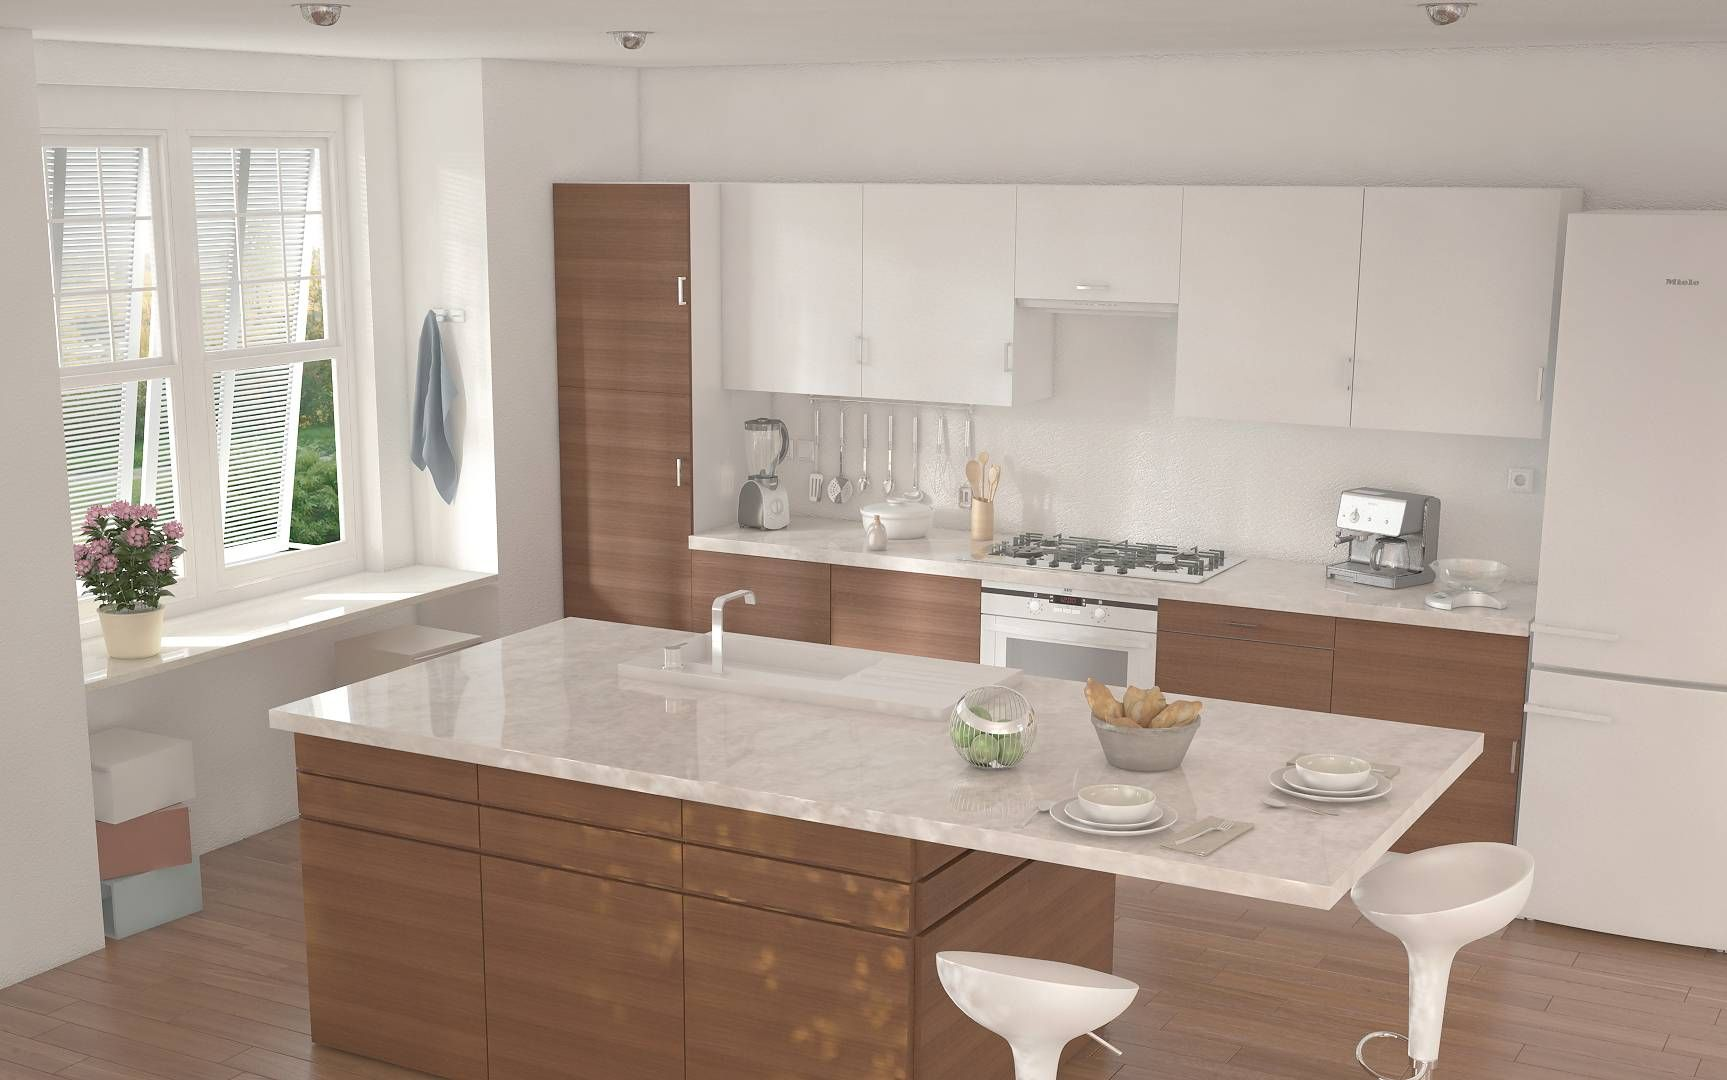 cucina con isola centrale ikea - Cerca con Google | arredo-cucina ...